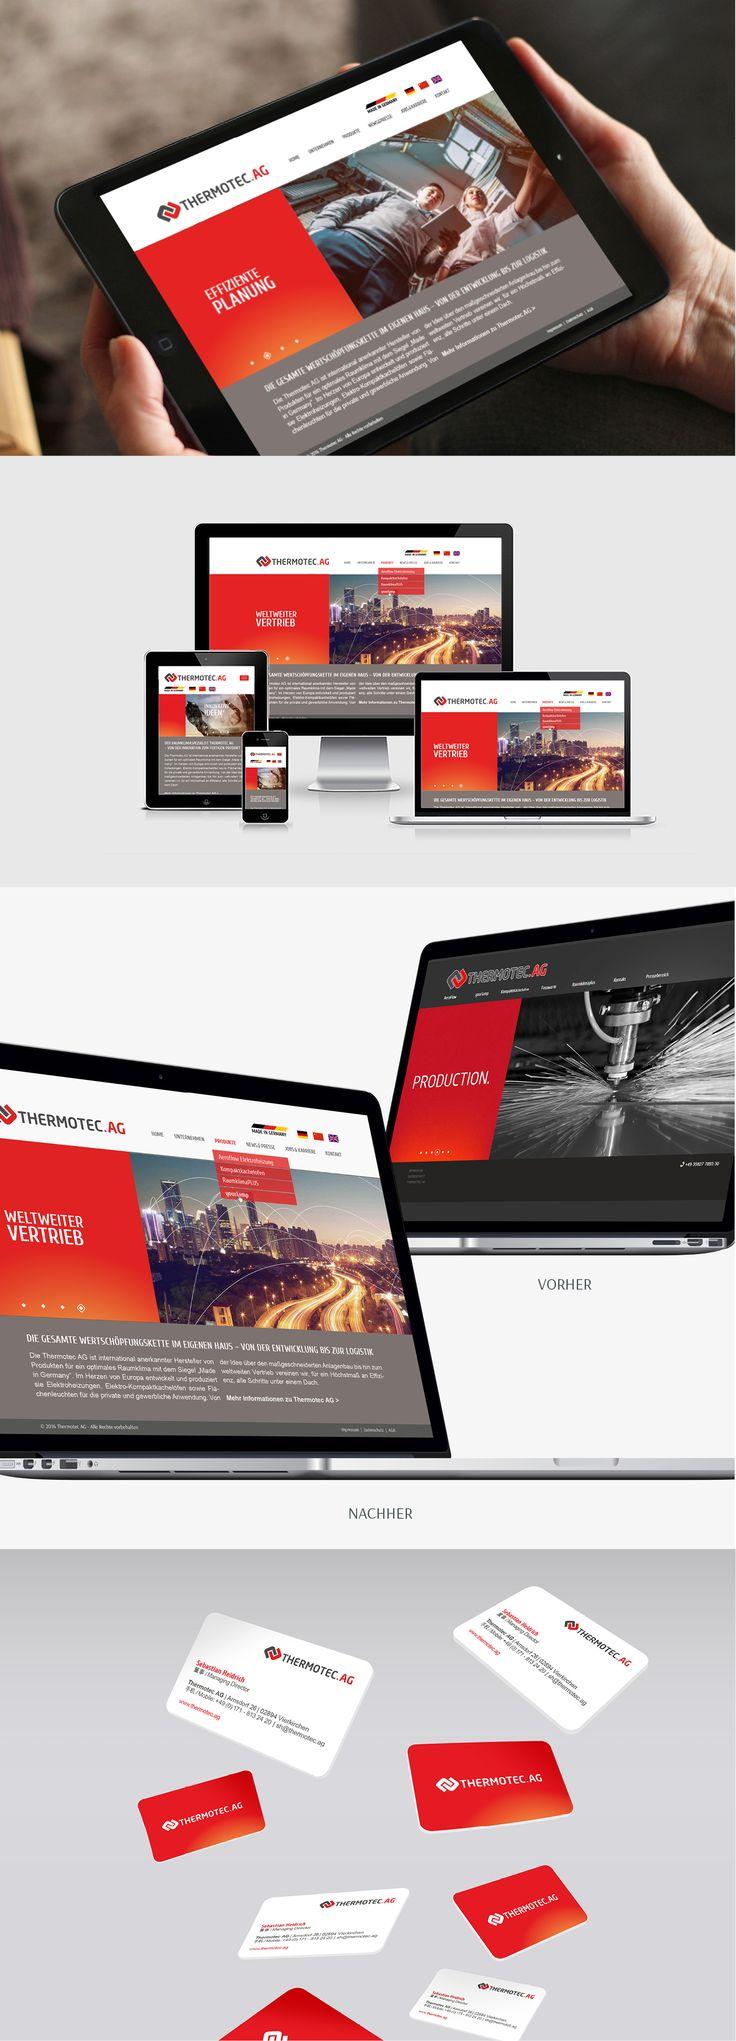 Zitronengrau Leipzig Webdesign Redesign Thermotec AG